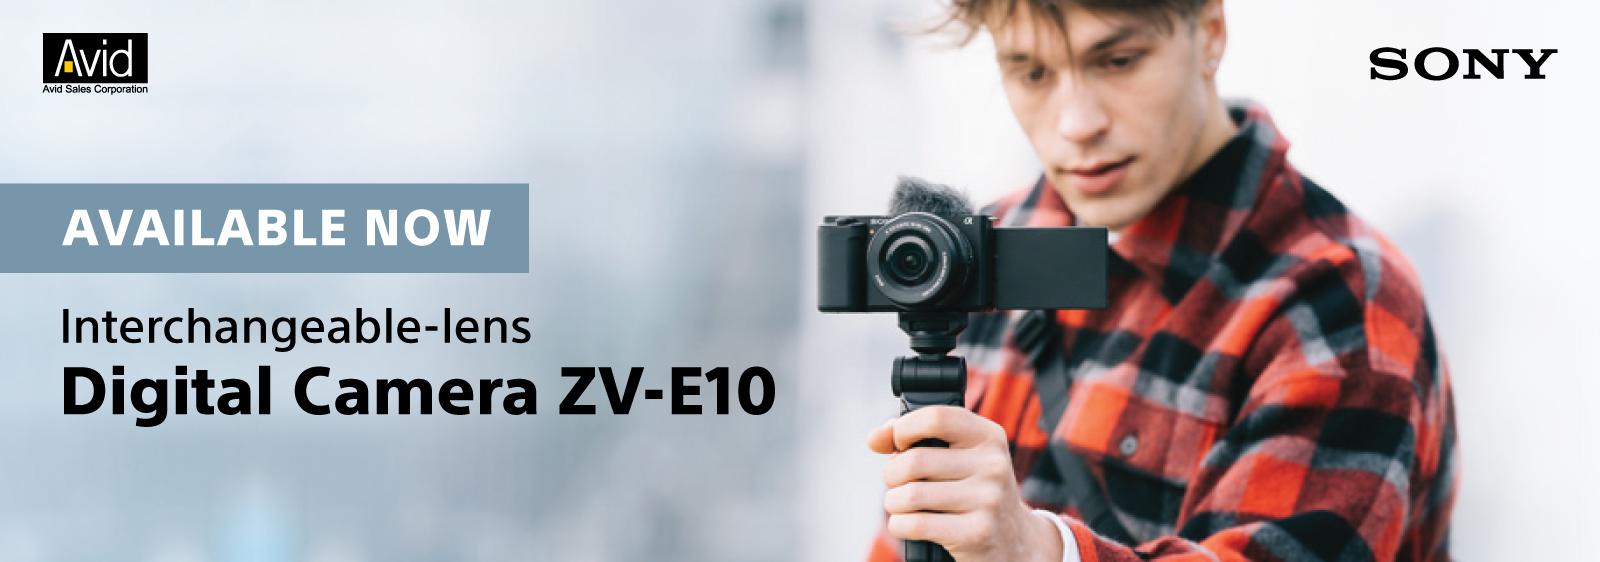 AVID-WEB-BANNERS_ZVE10_1600x562px